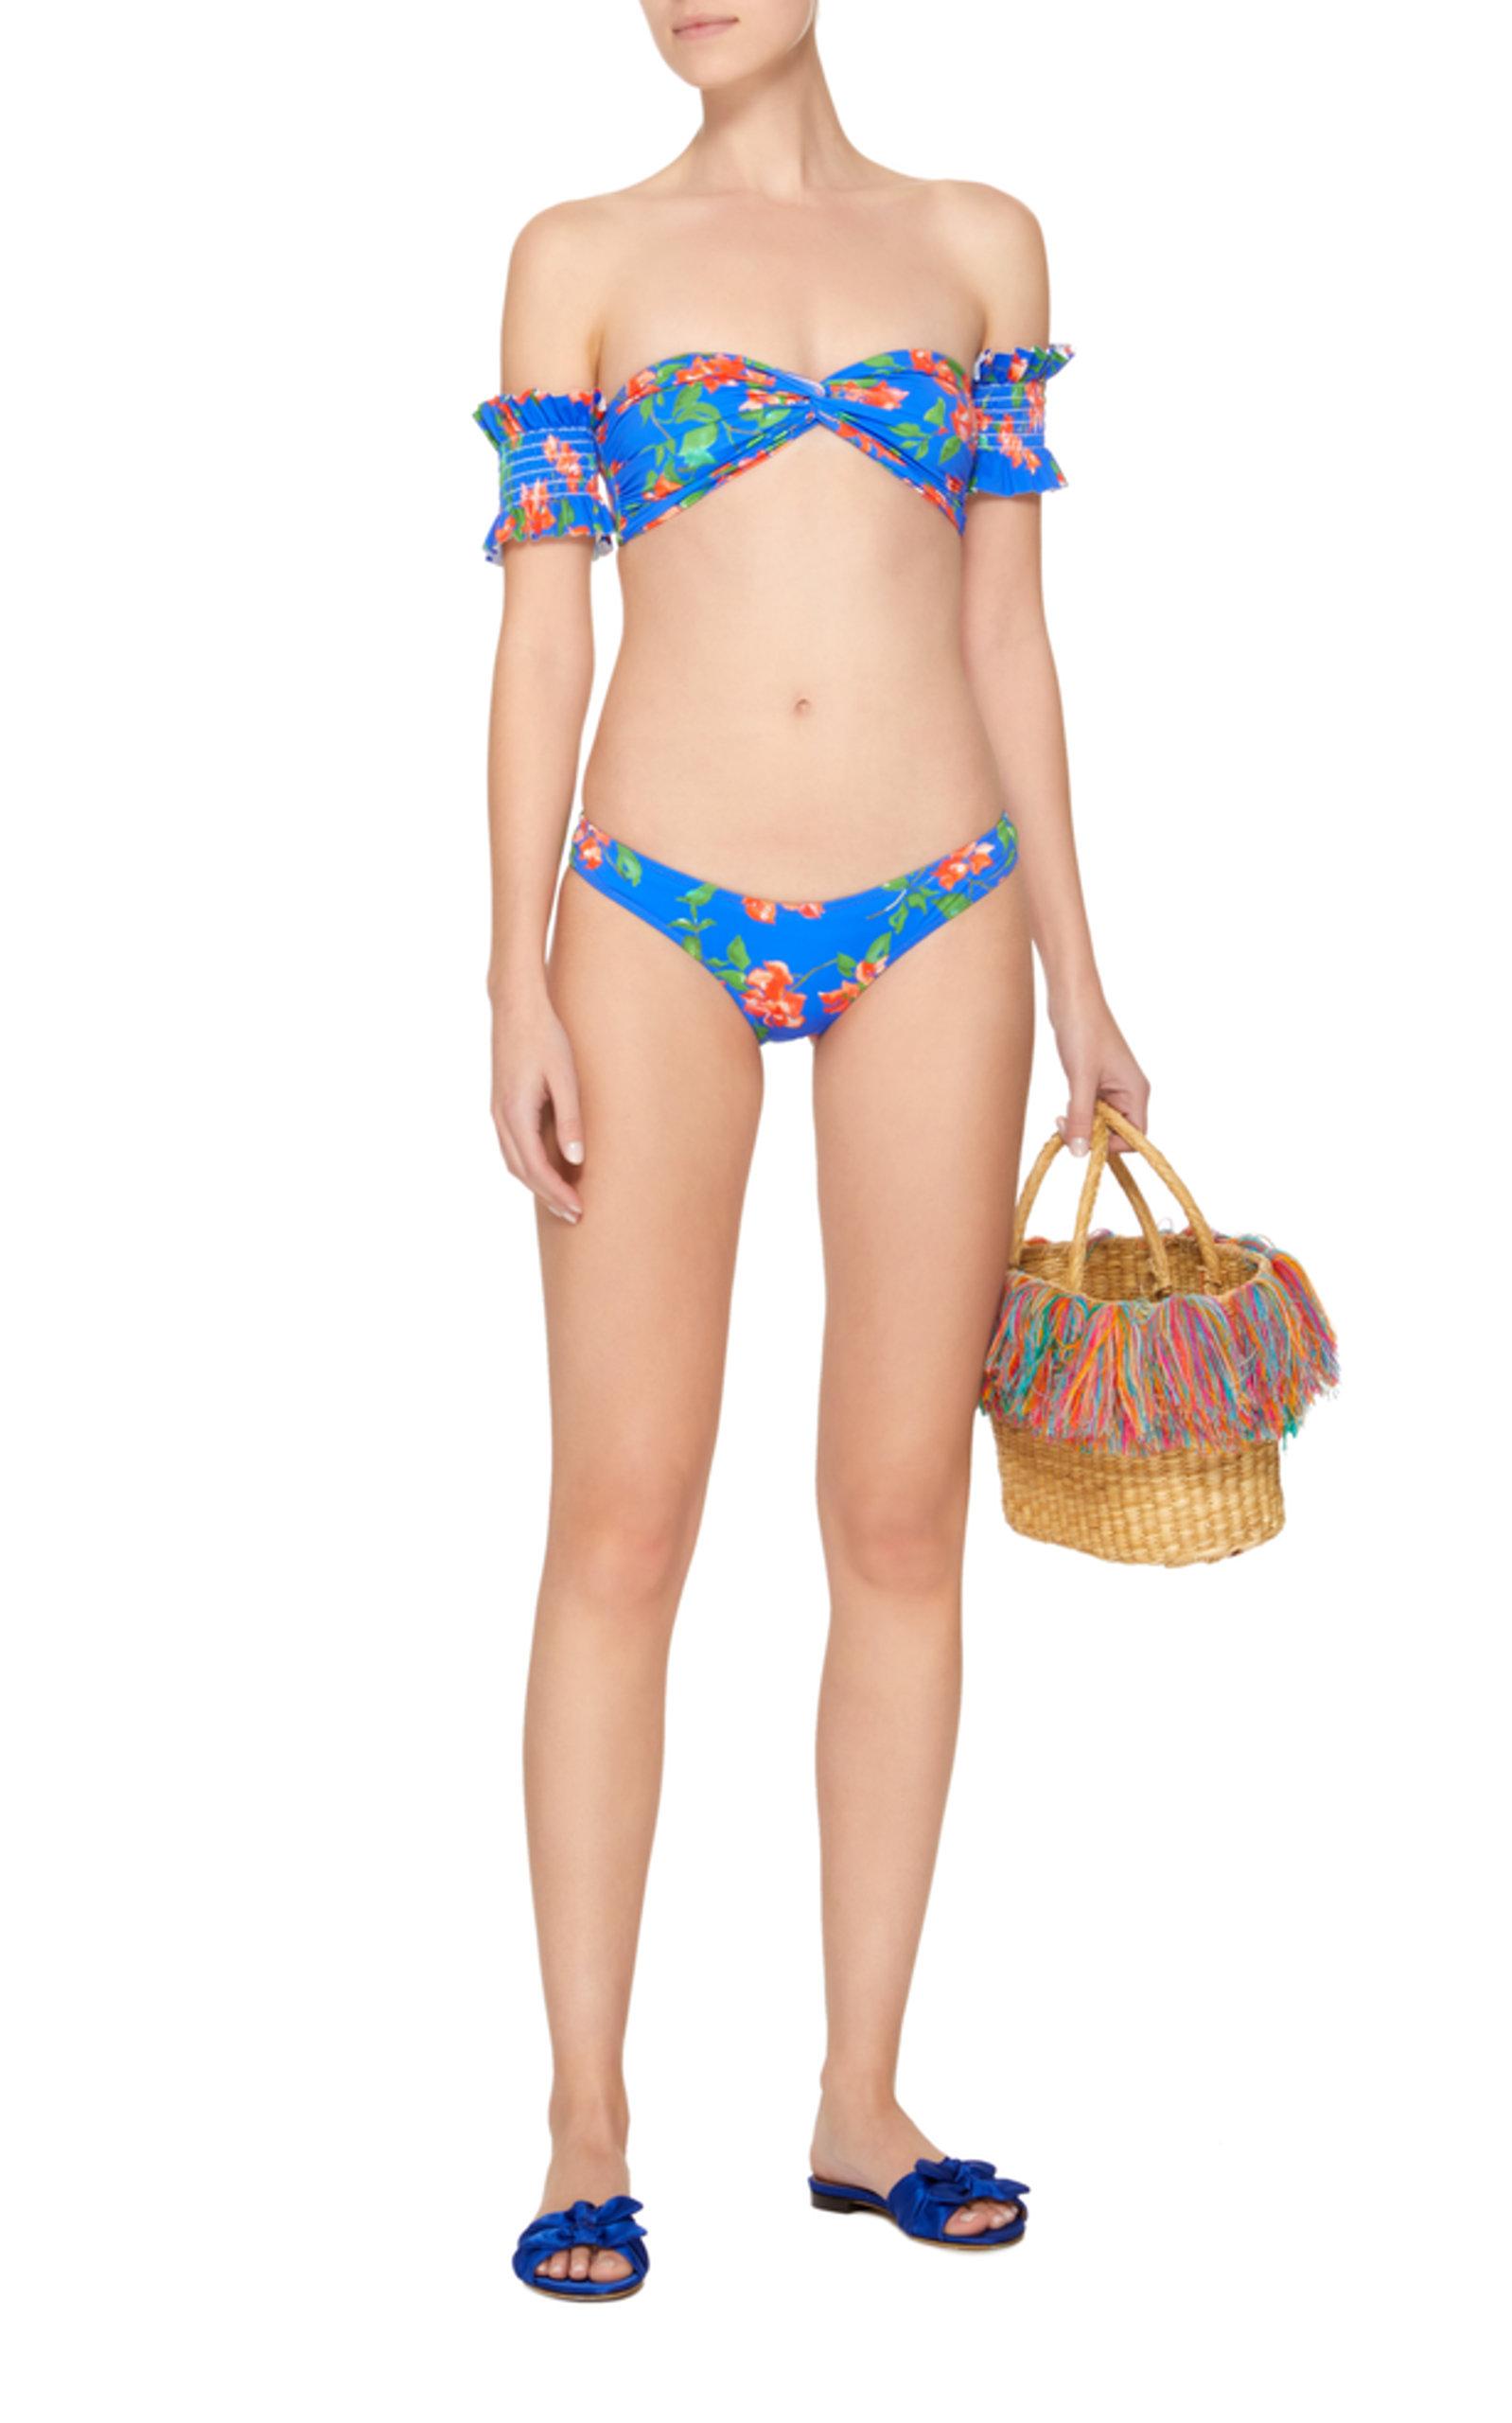 Adros Off Shoulder Floral Bandeau Bikini Top Caroline Constas Buy Cheap Find Great PJ4pz1